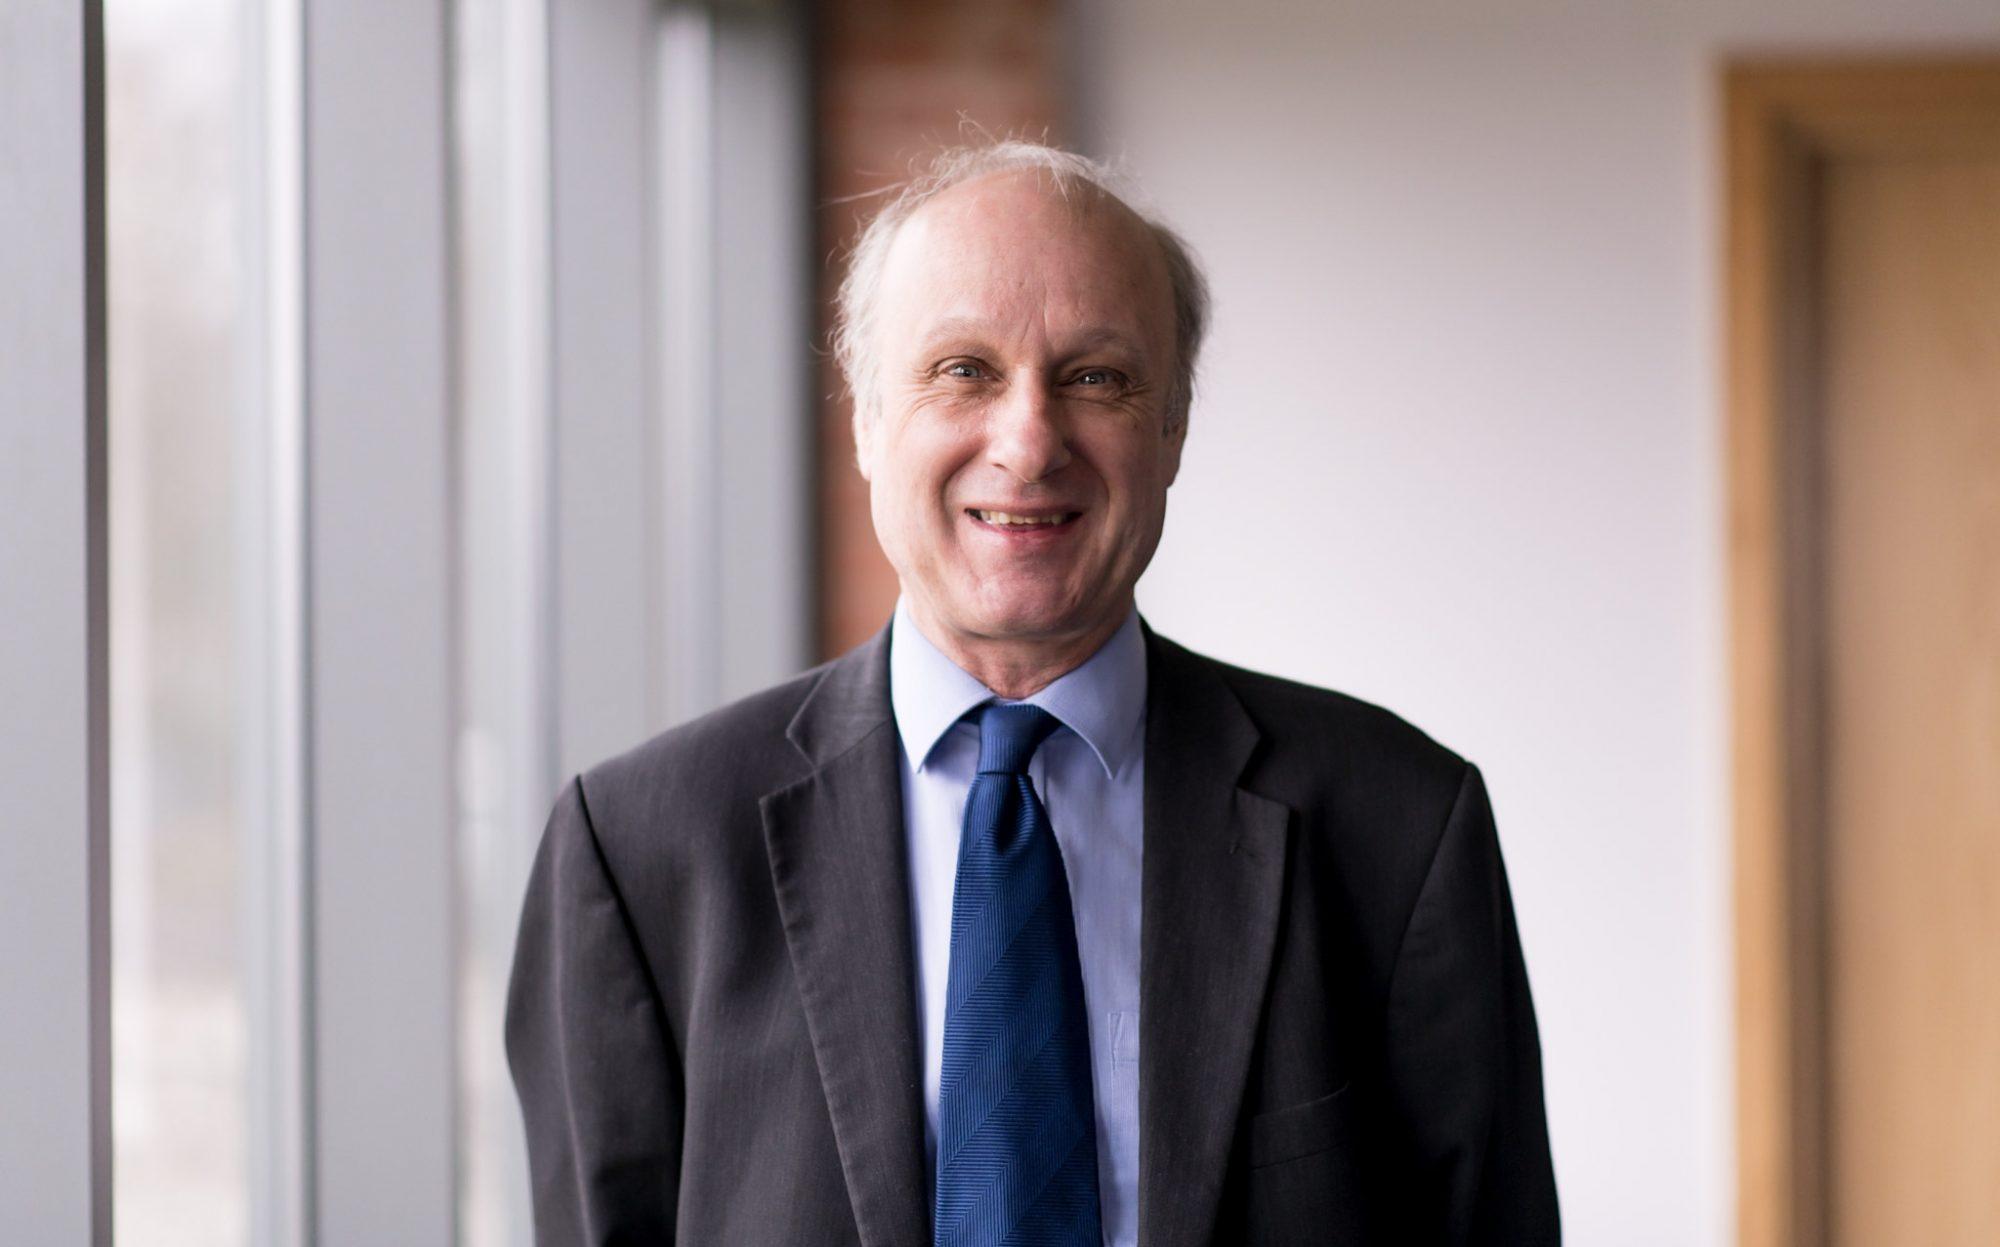 Richard Monro